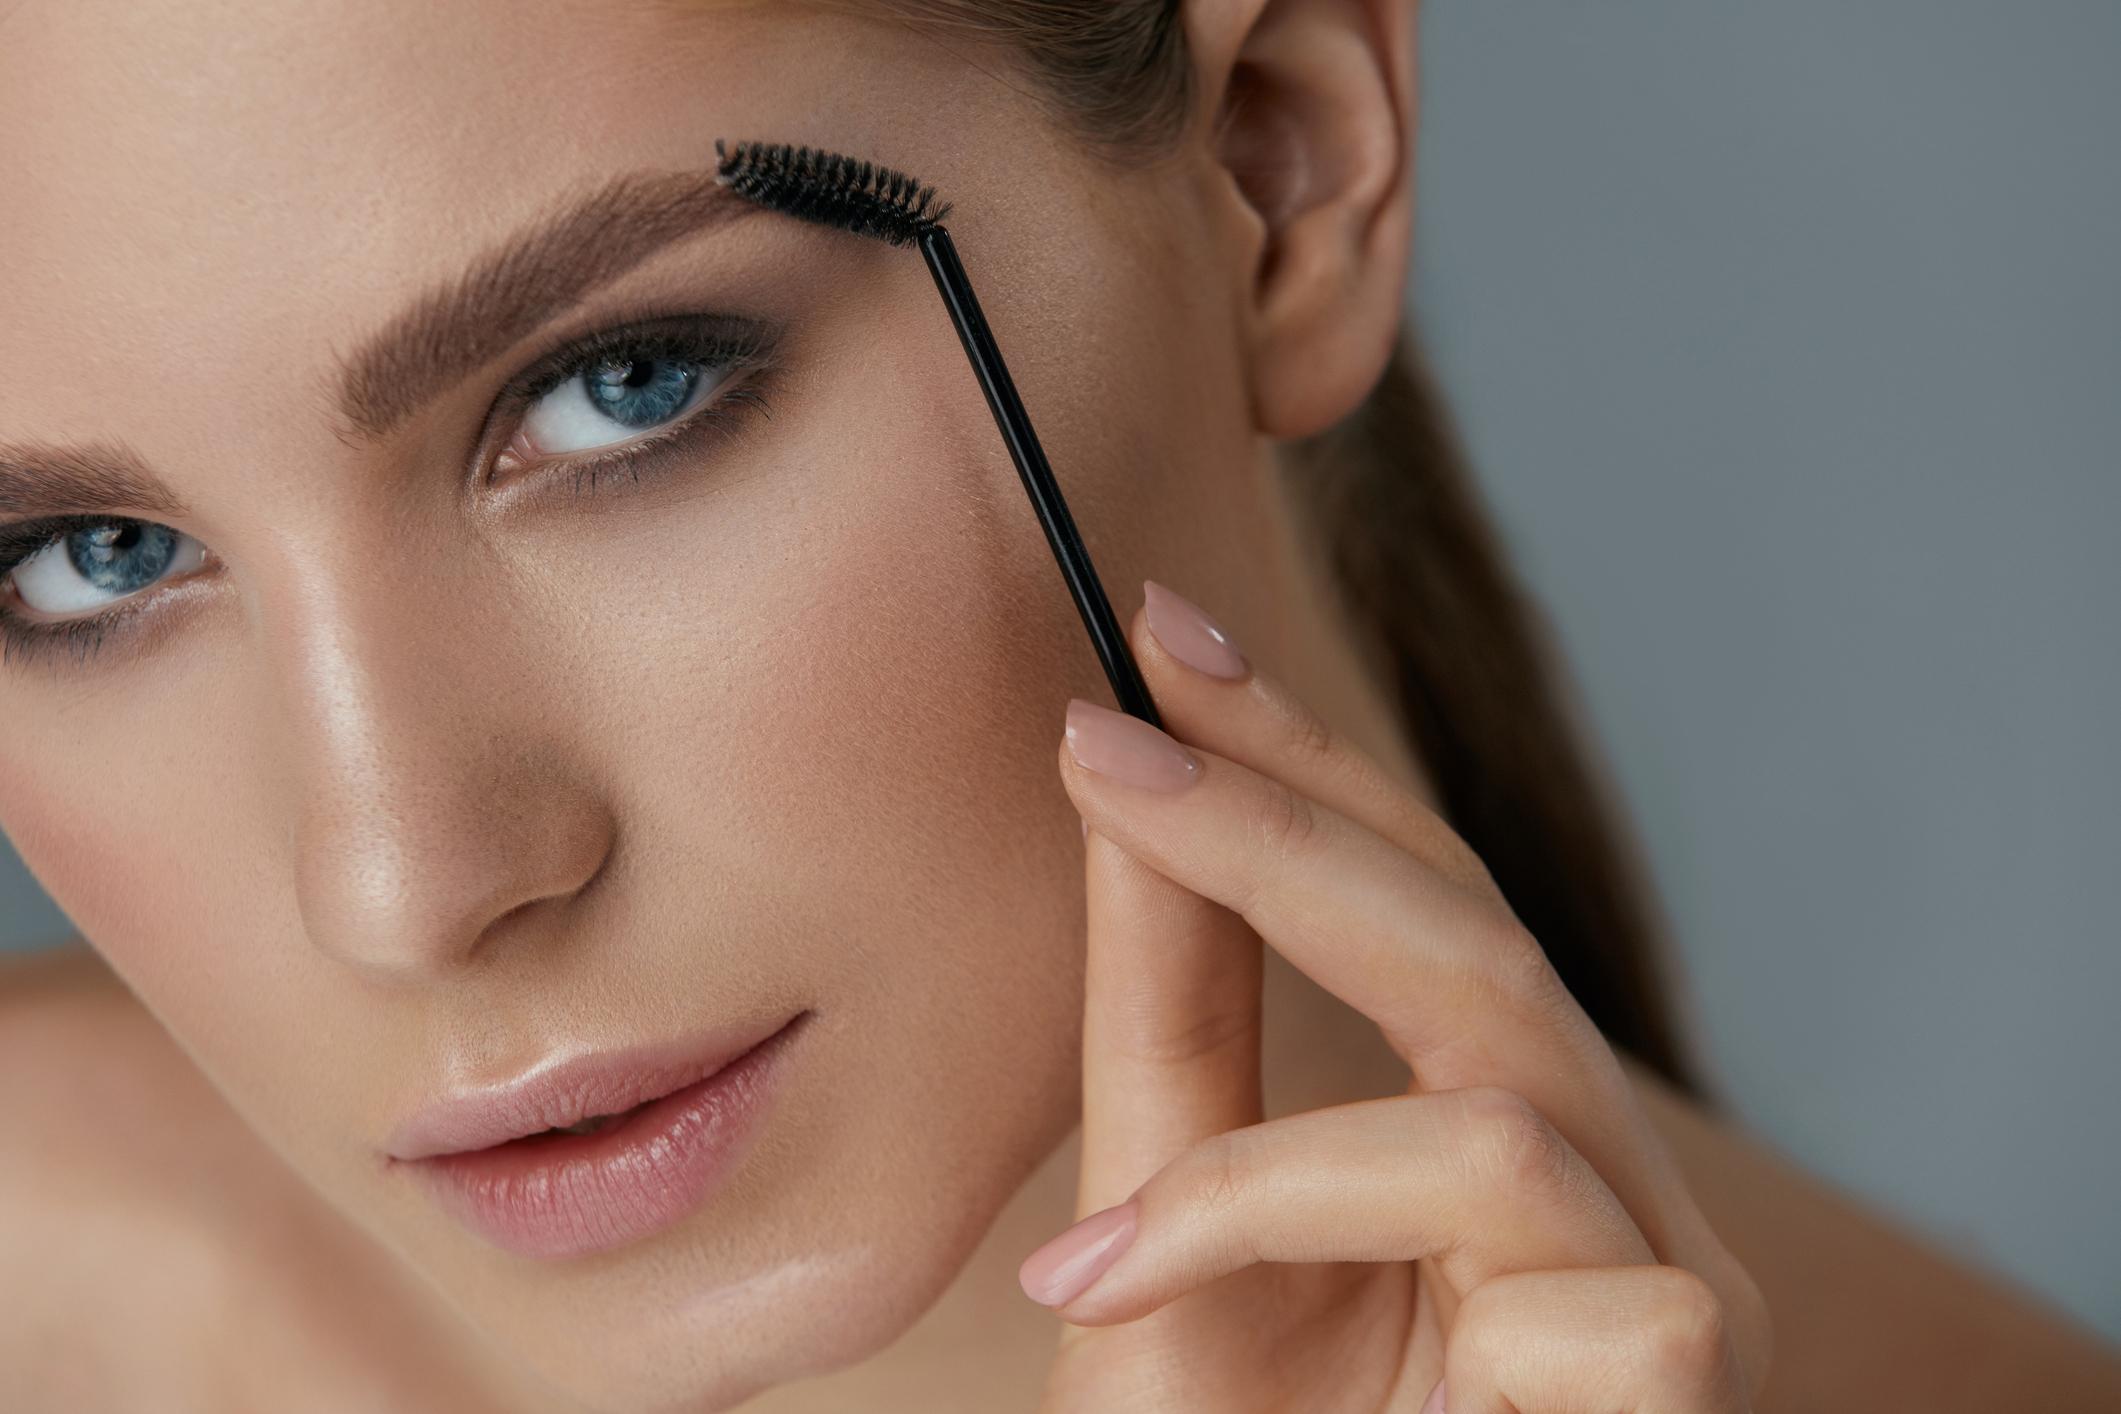 eyebrow makeup woman